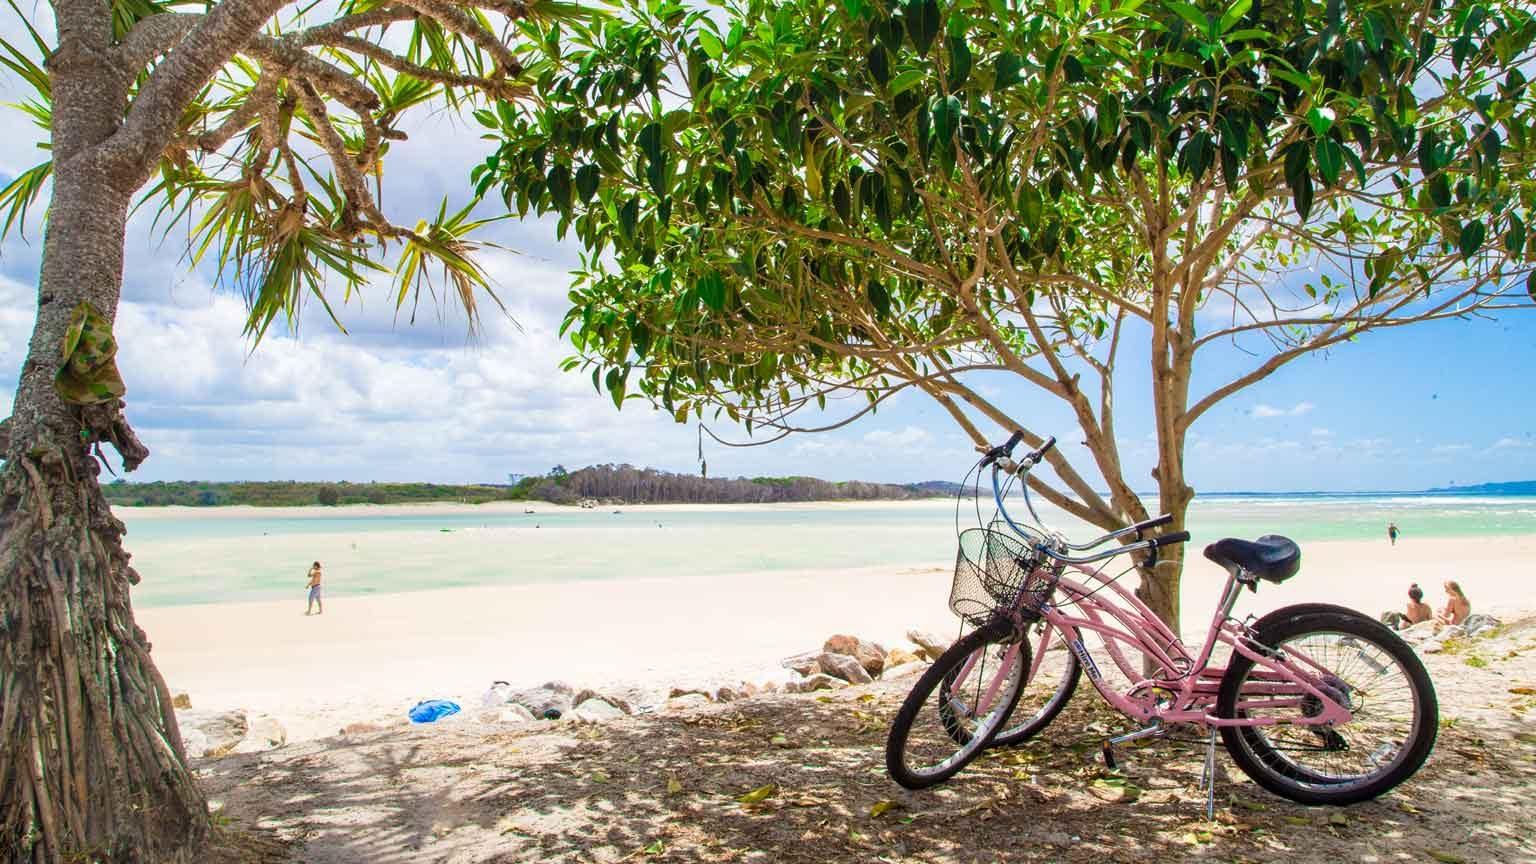 A bike ride along the shore at Noosa